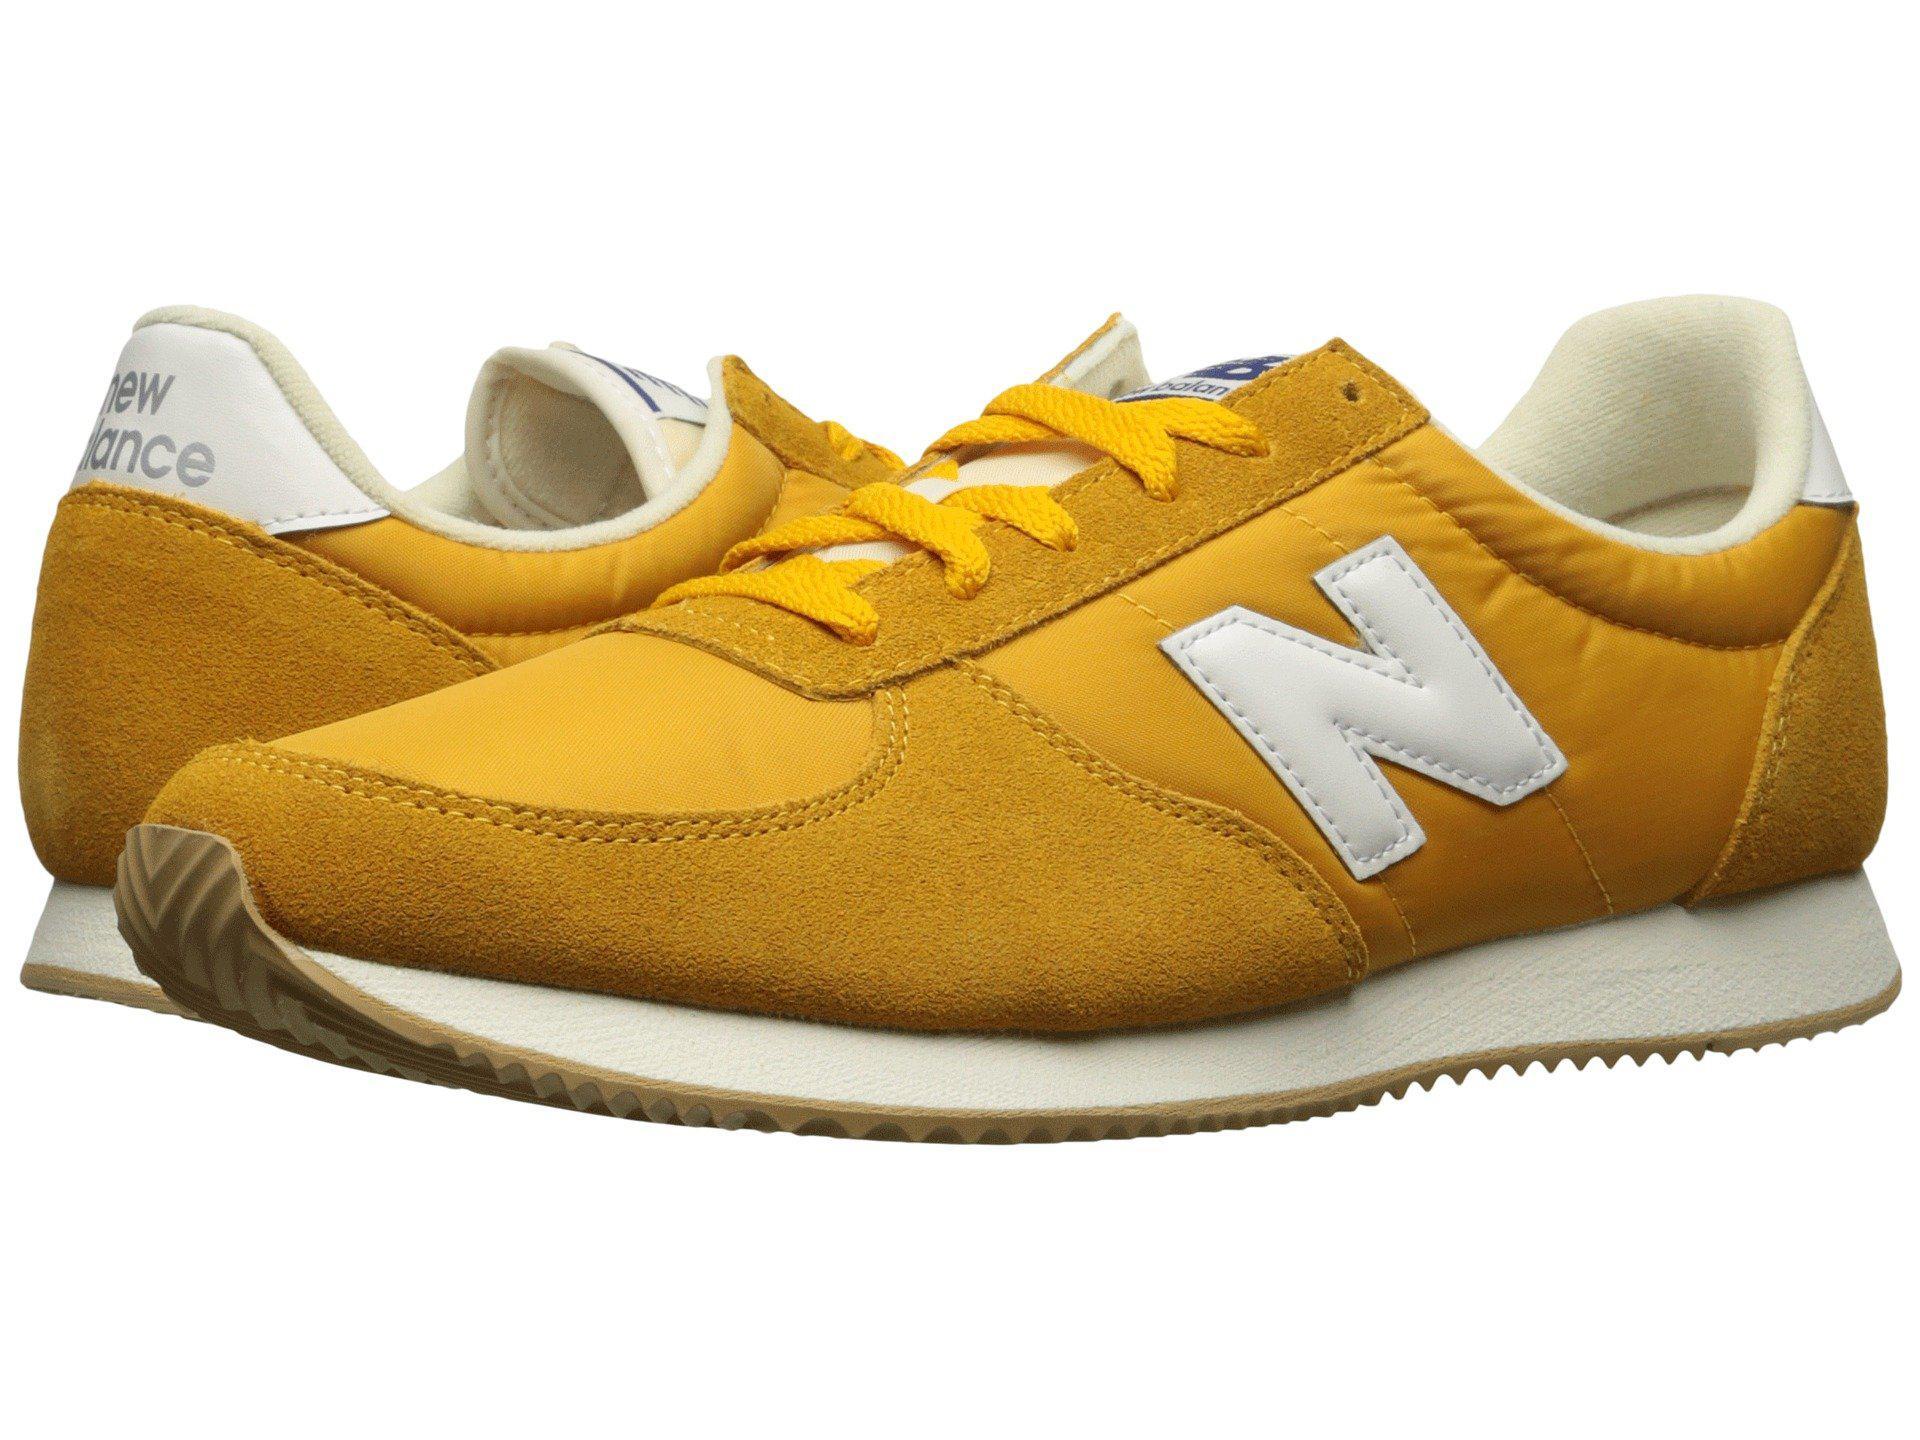 New Balance Men's Sneakers U220 Classic Yellow